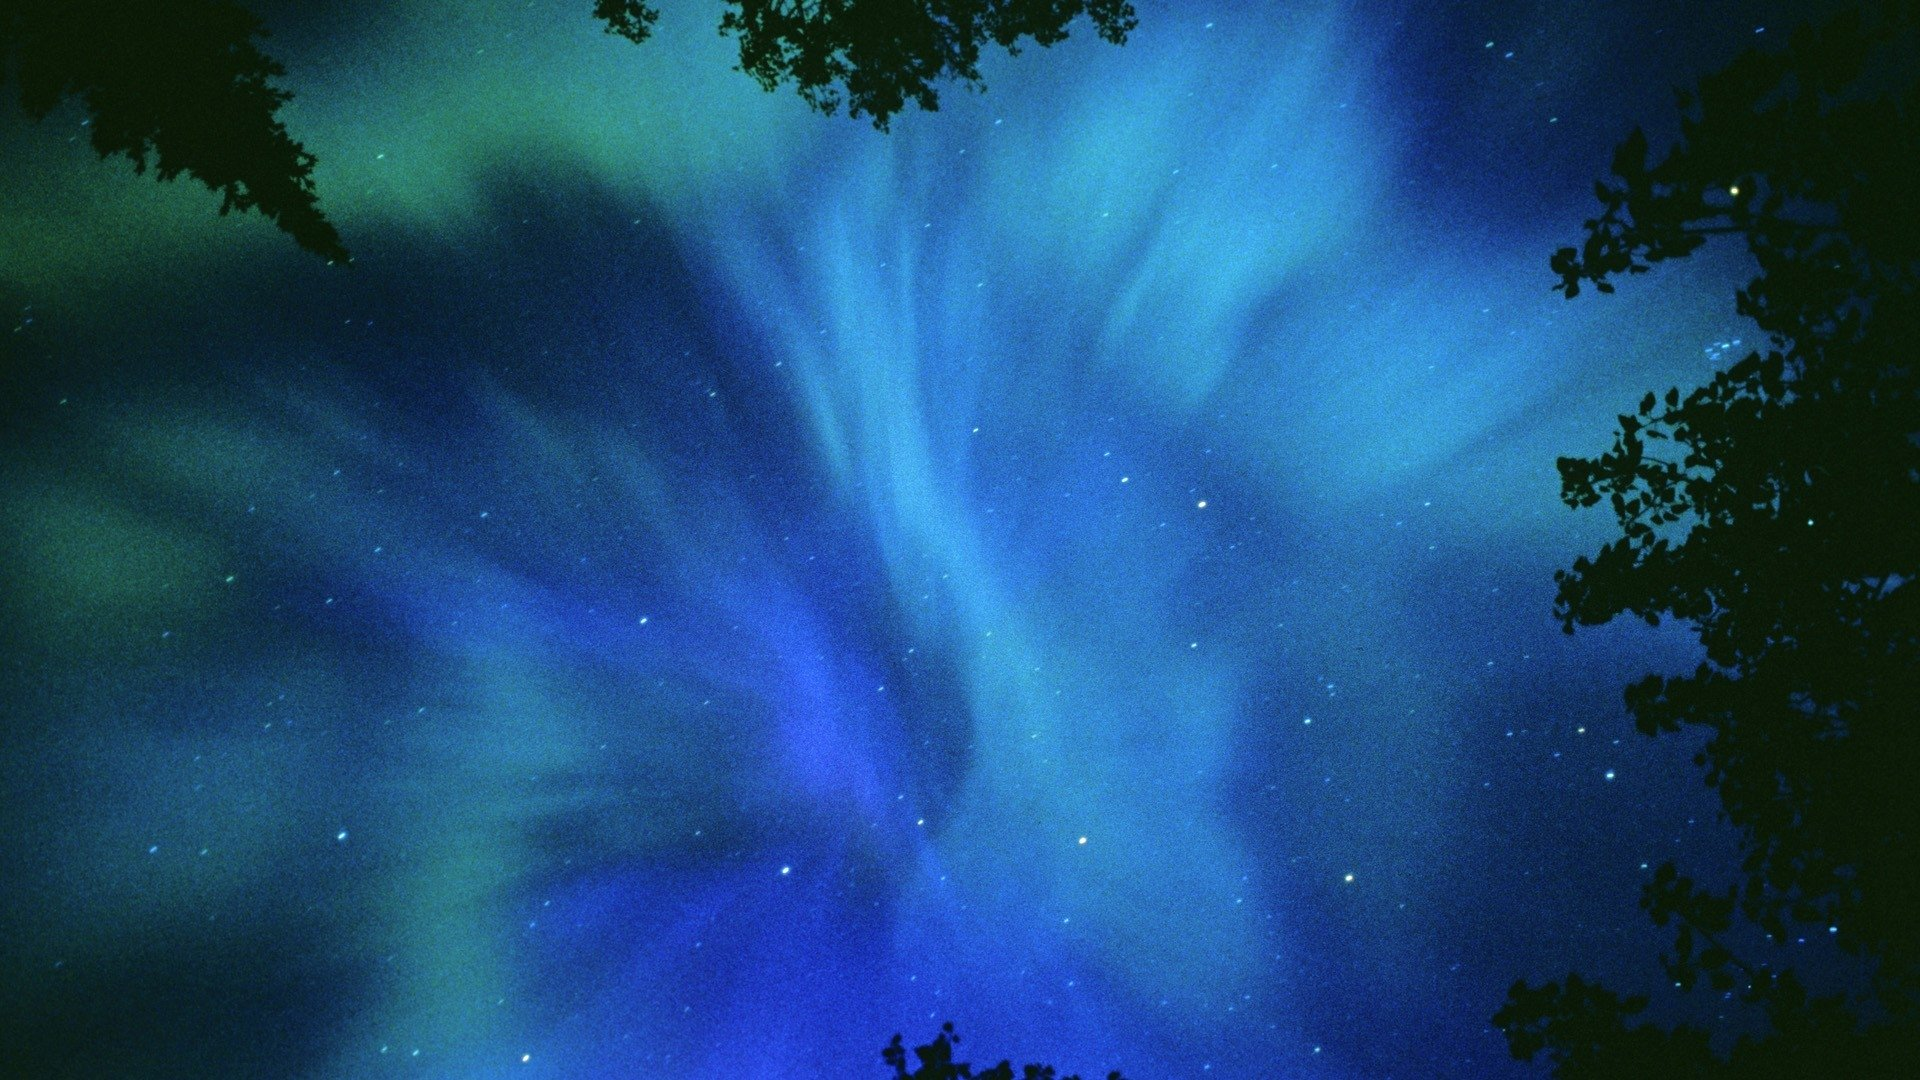 Aurora Sky Fond D Ecran Hd Arriere Plan 1920x1080 Id 820847